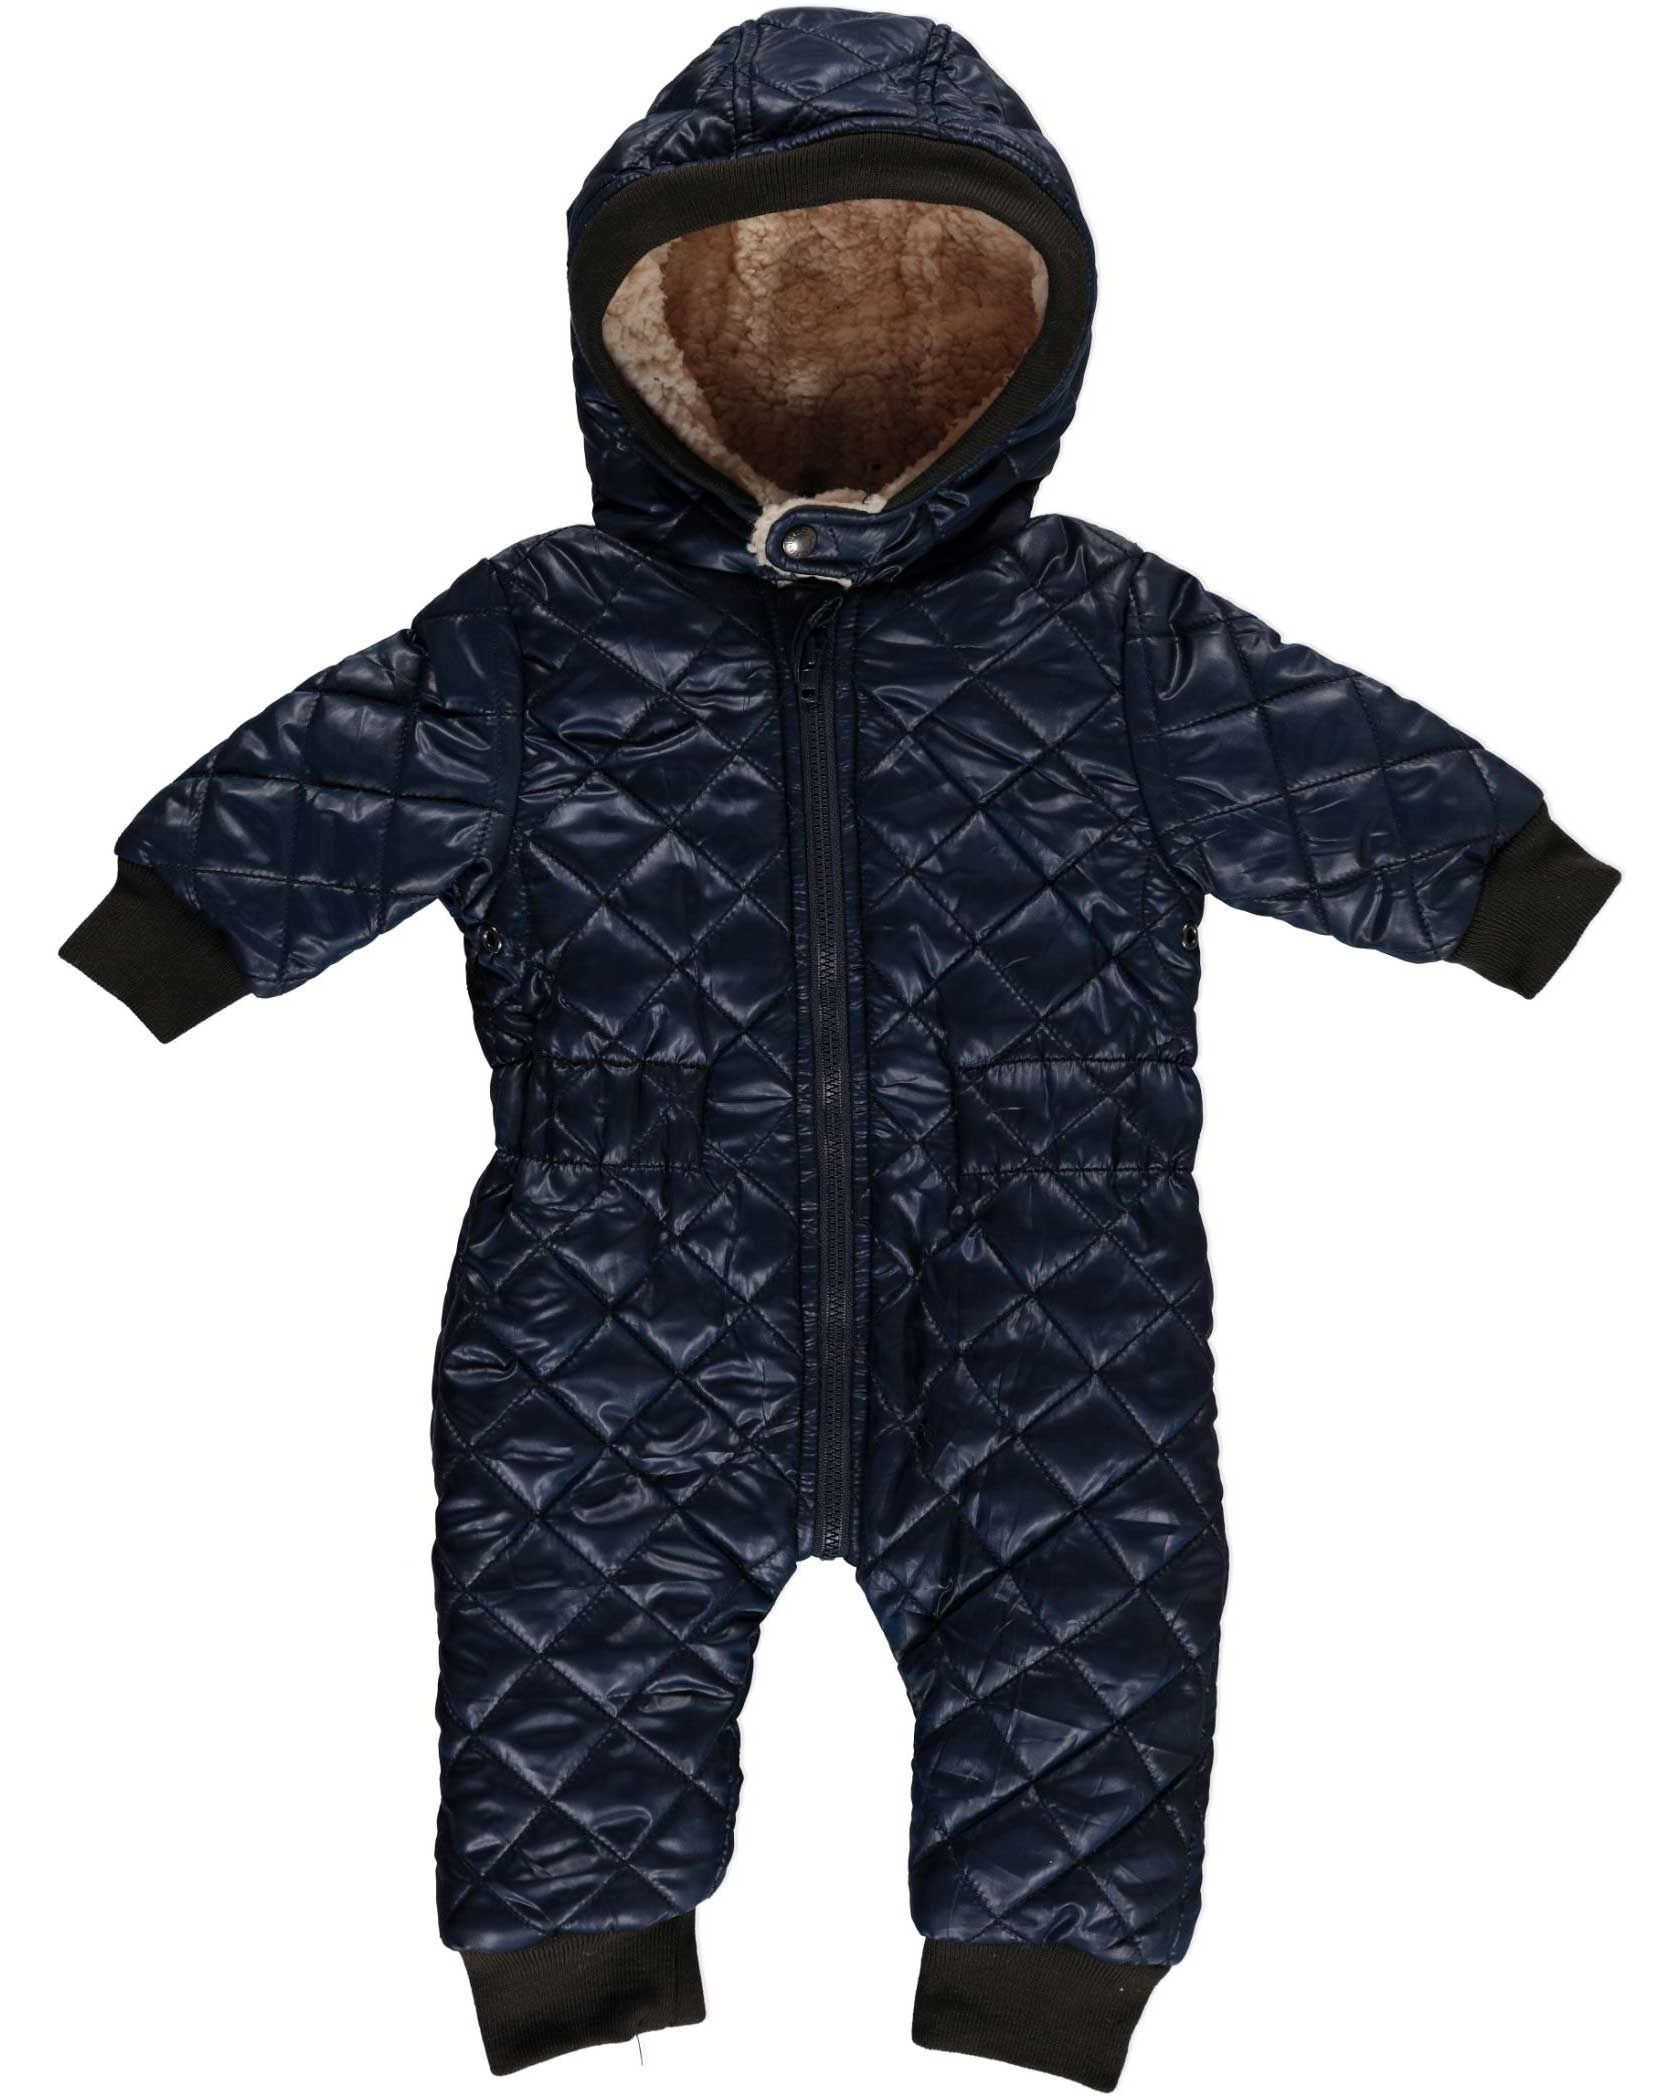 f81ea5848 KIDSCASE Luke baby suit | Outside - Children | Baby suit, Baby, Suits